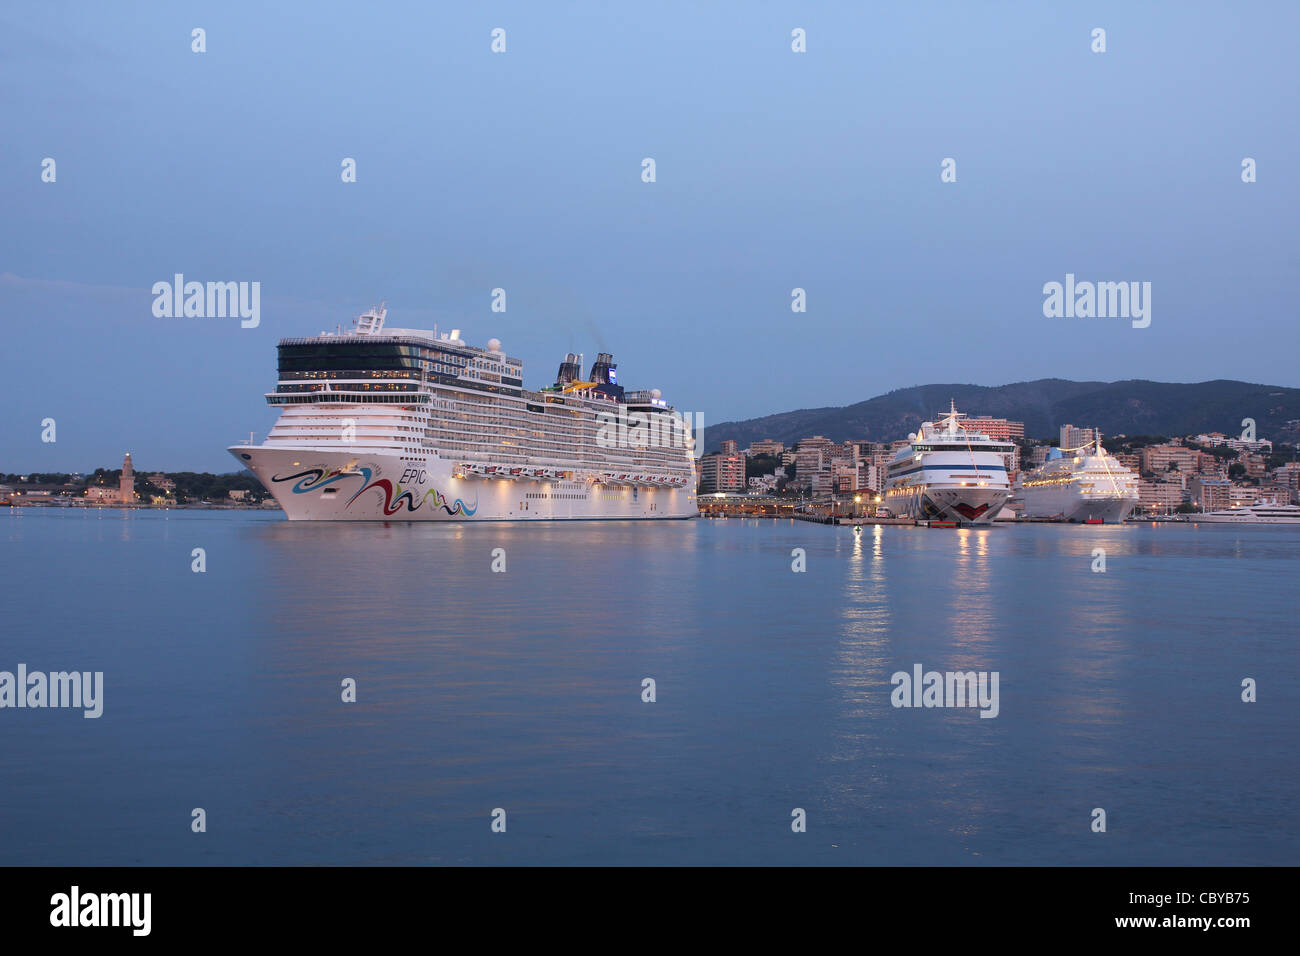 Pre dawn arrival - Norwegian Cruise Line (NCL) Cruise Liner 'Norwegian Epic' in Port of  Palma de Mallorca - Stock Image